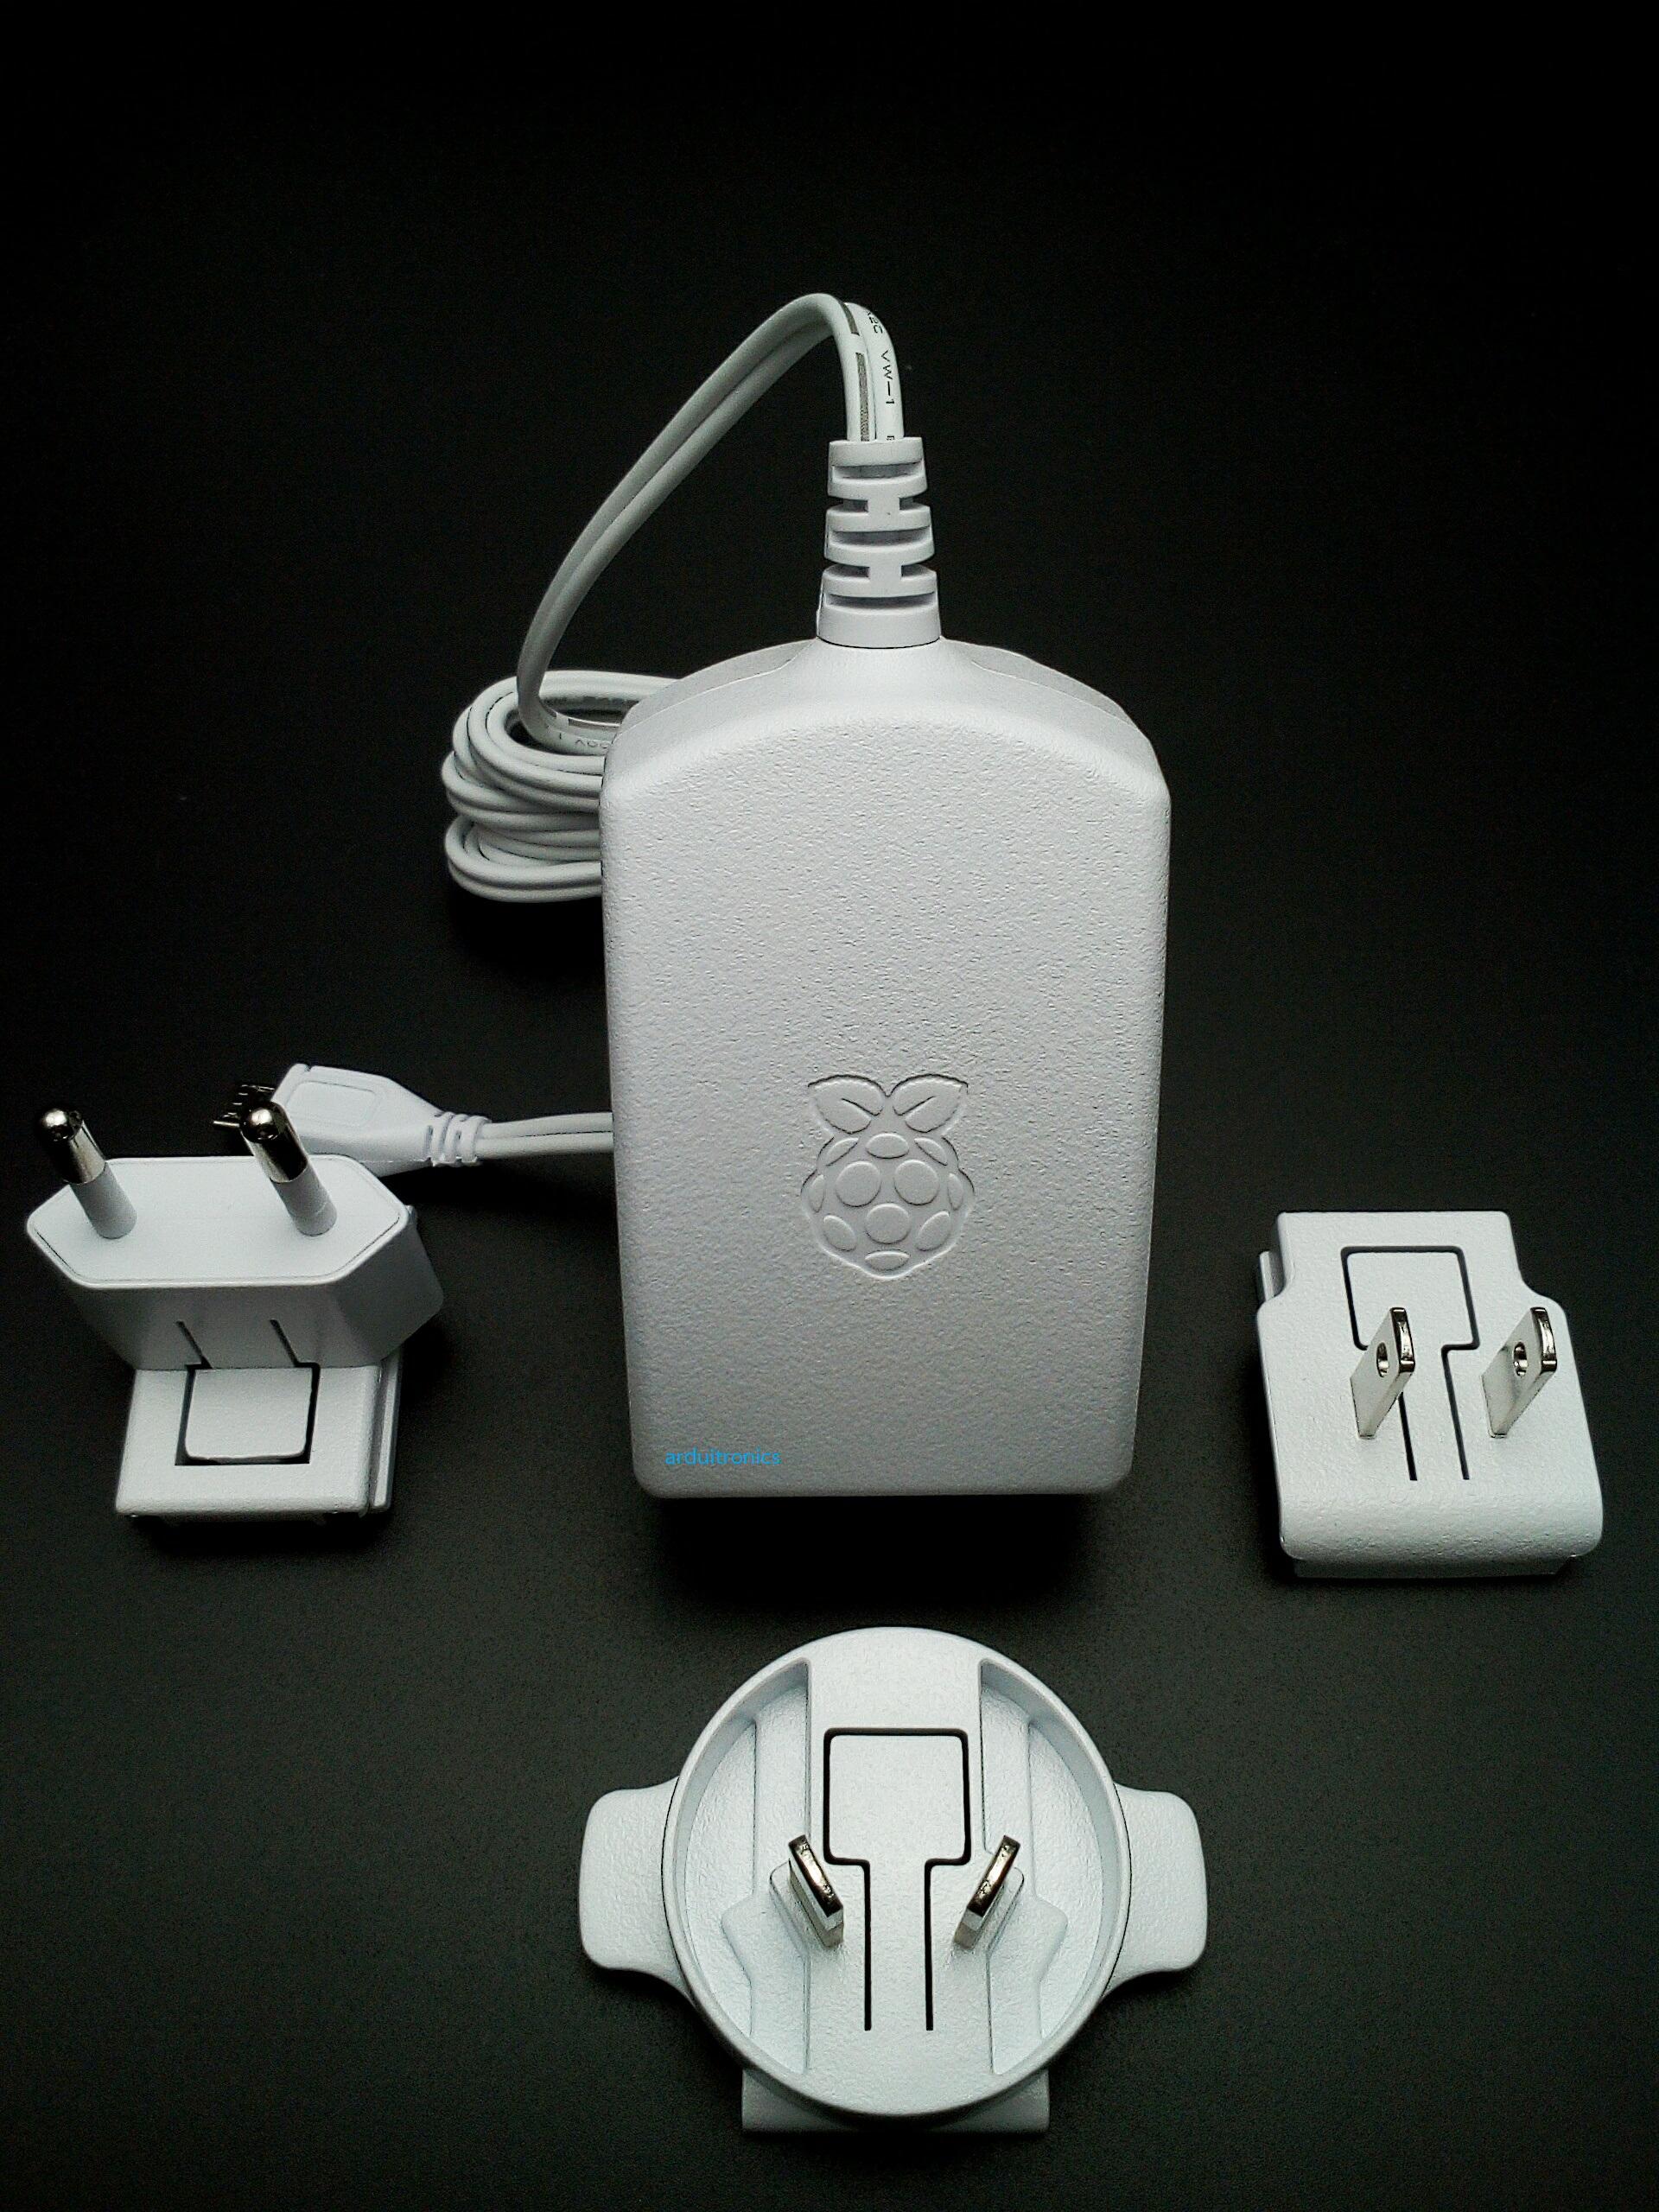 Official Power Supply (5.1V, 2.5A) for Raspberry Pi (สีขาว มีโลโก้ Pi สลักบนหัวปลั๊ก) + 4 Multi-national Heads